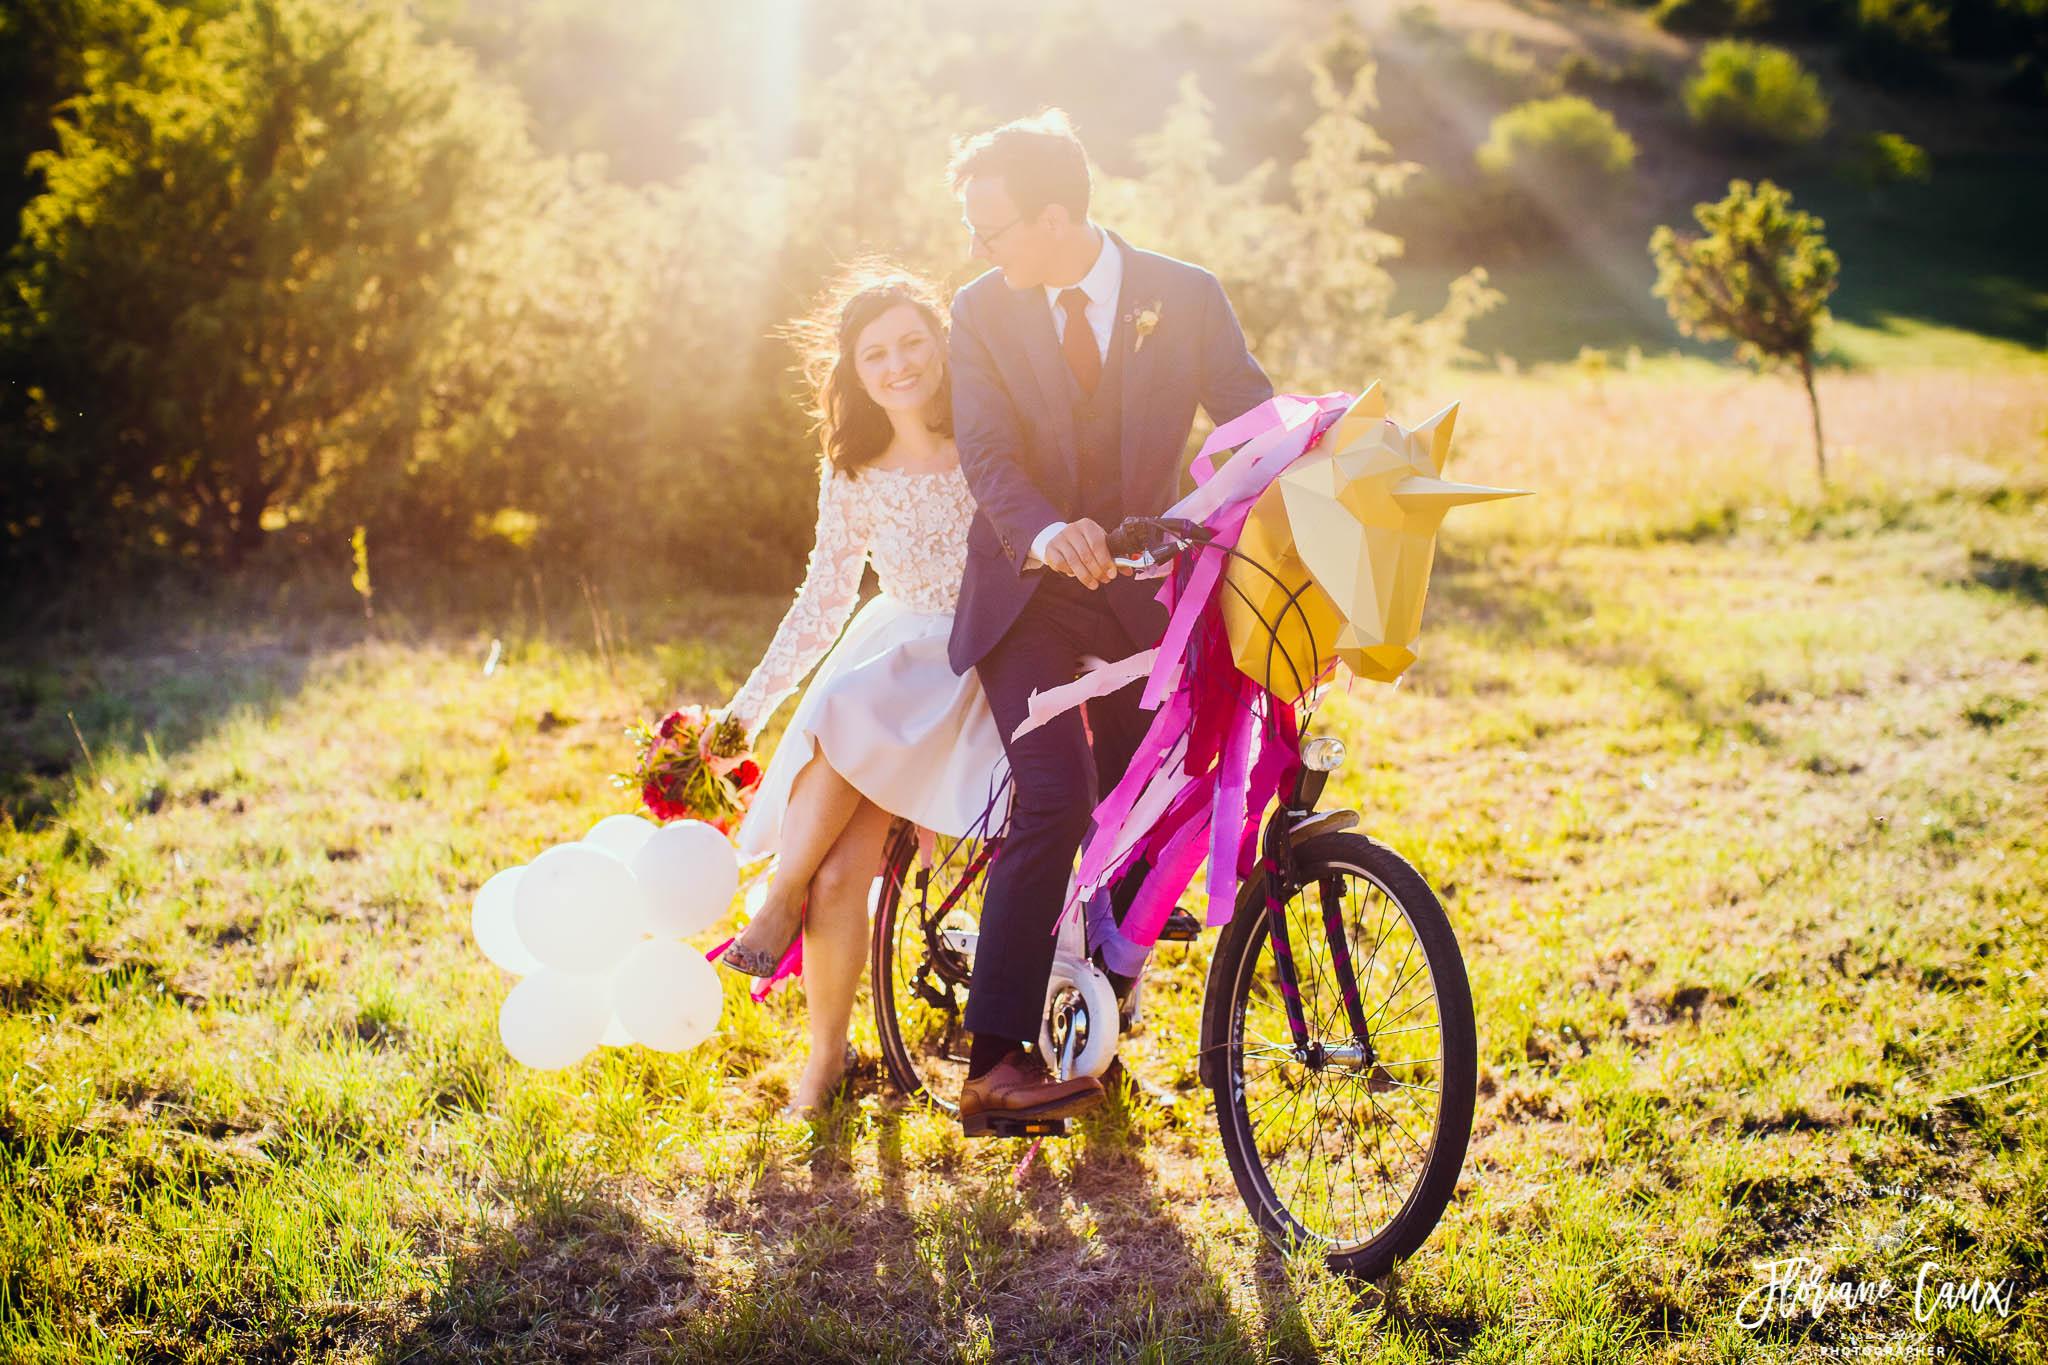 mariage-festival-cahors-ceremonie-laique-velo-licorne-8